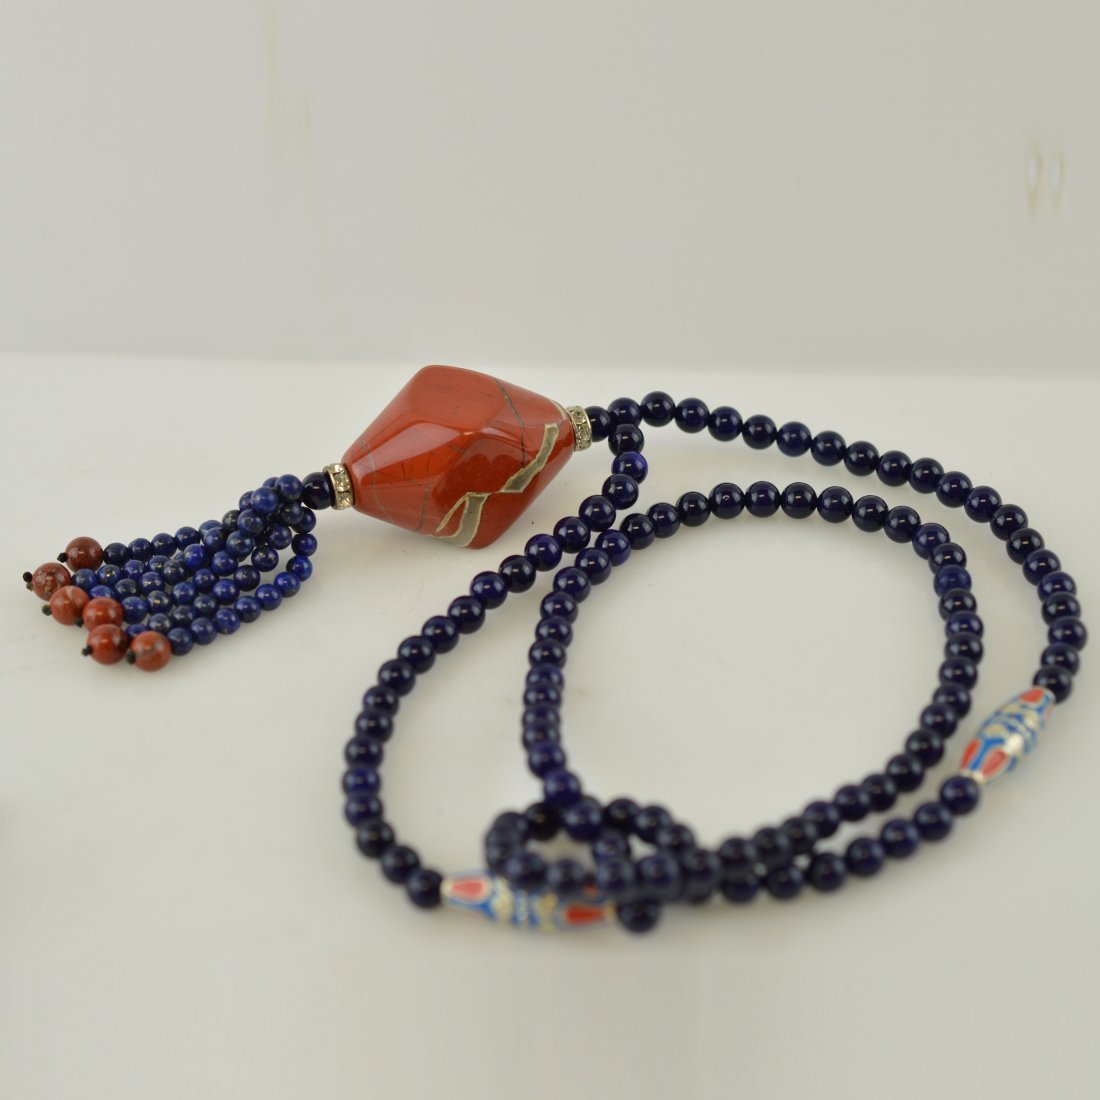 Nanhong Agate Pendant w/Lapis Lazuli Necklace